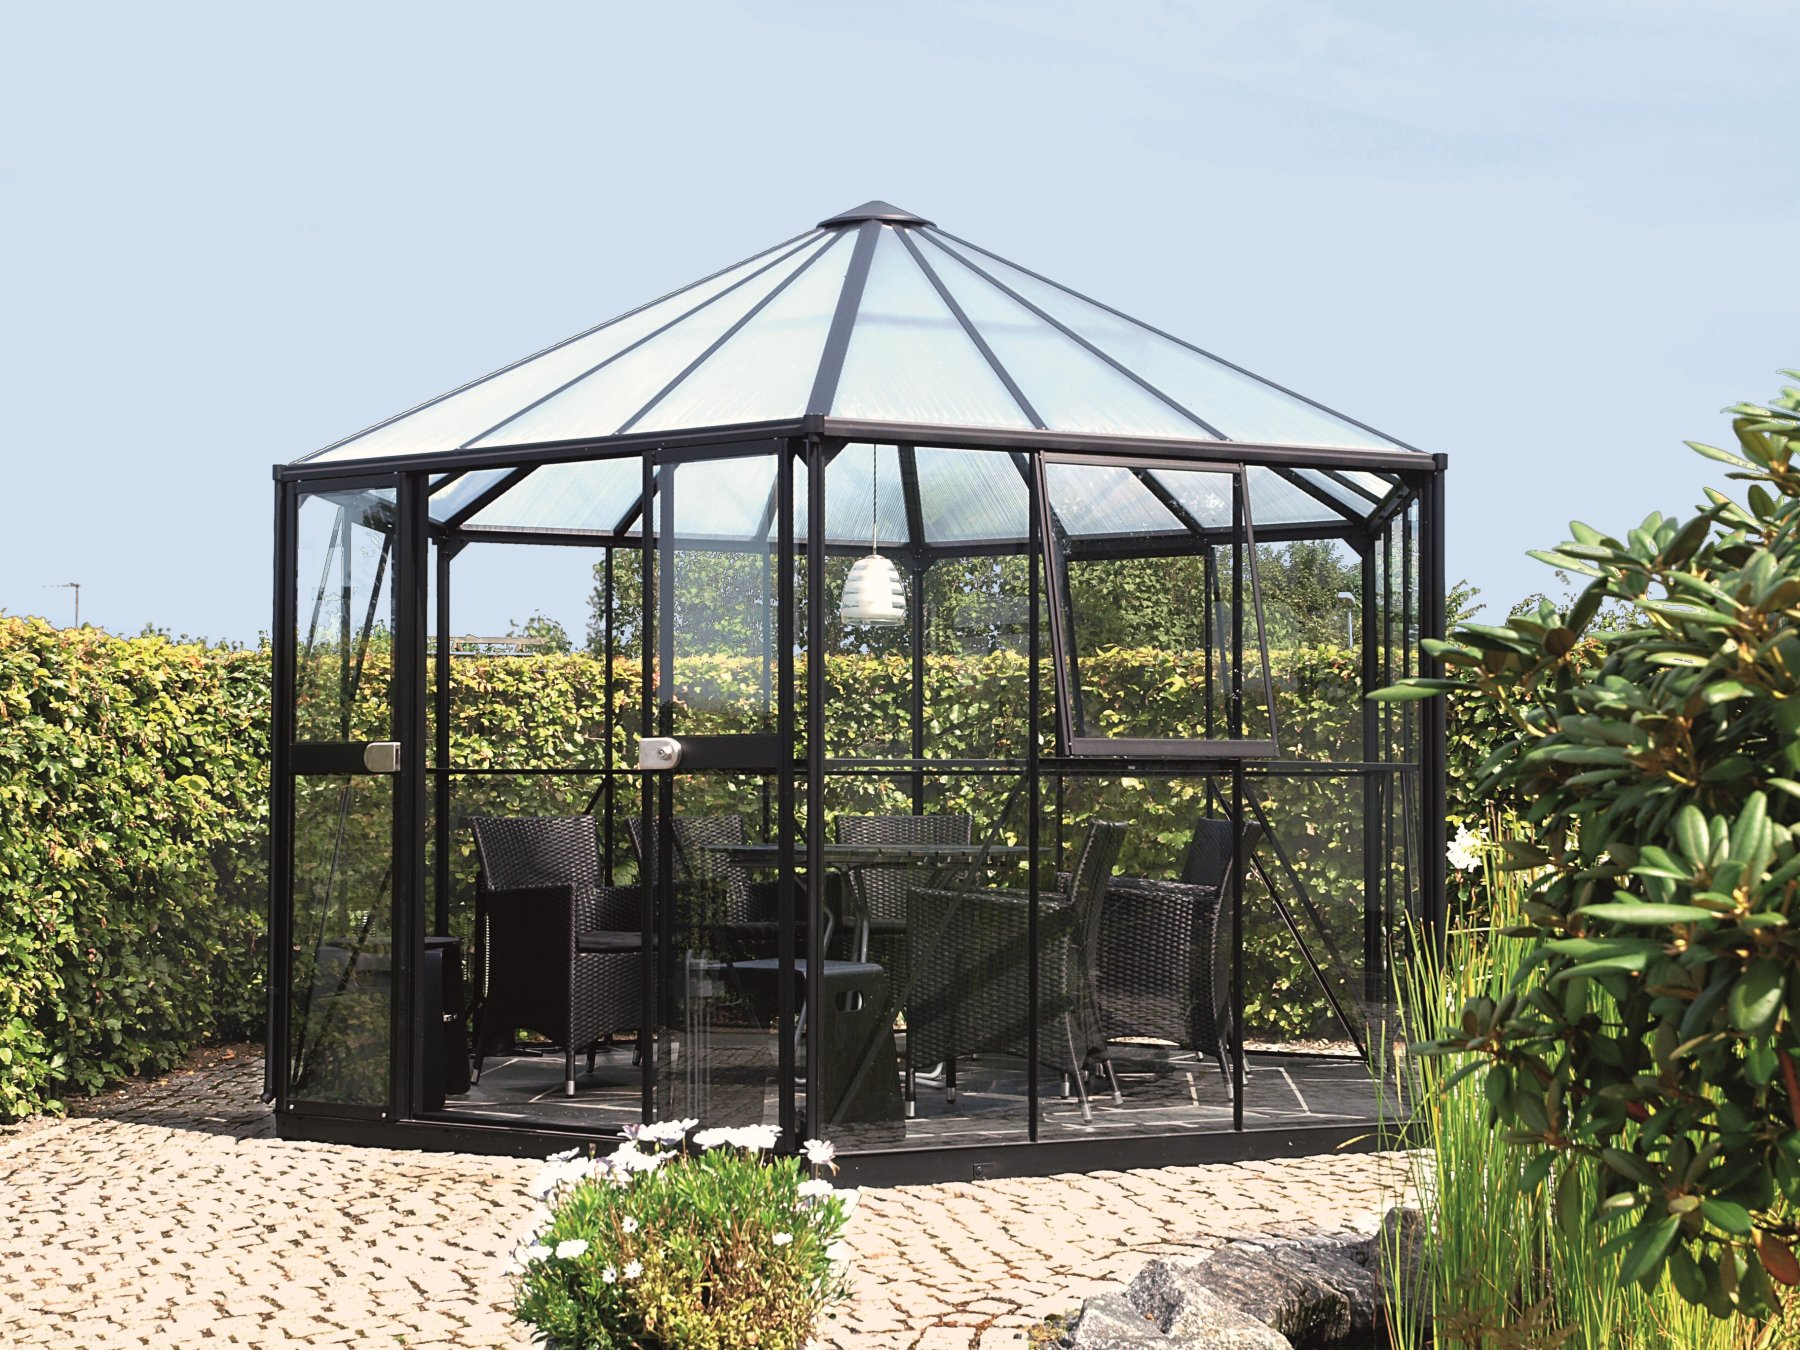 zahradní pavilon VITAVIA HERA 9000 černý